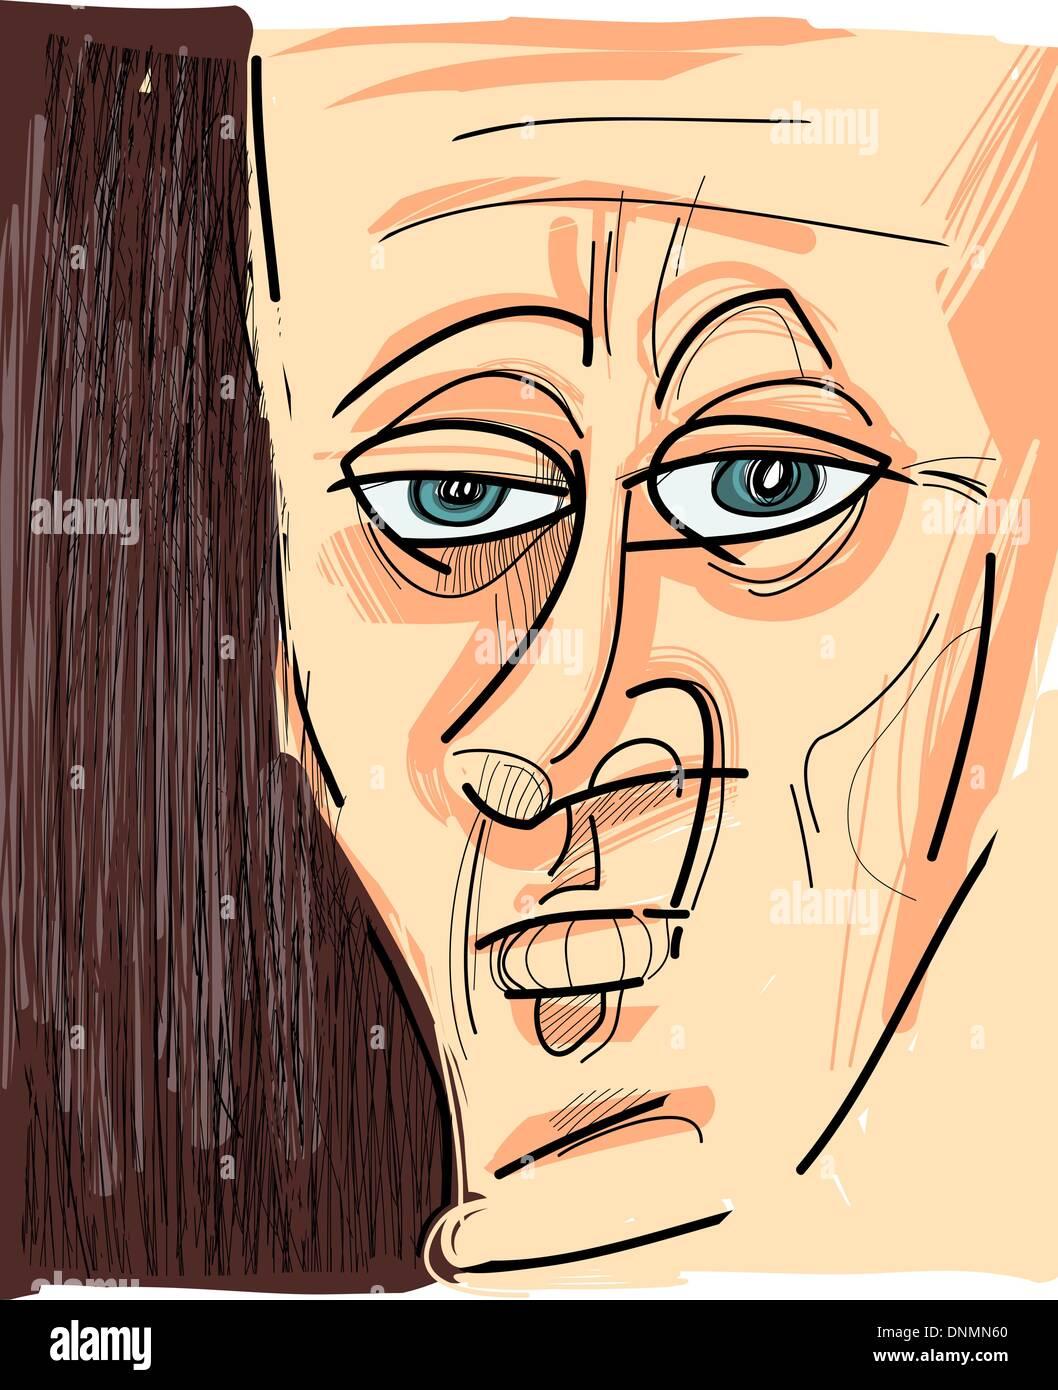 Sketch Cartoon Caricature Illustration of Man Face - Stock Vector